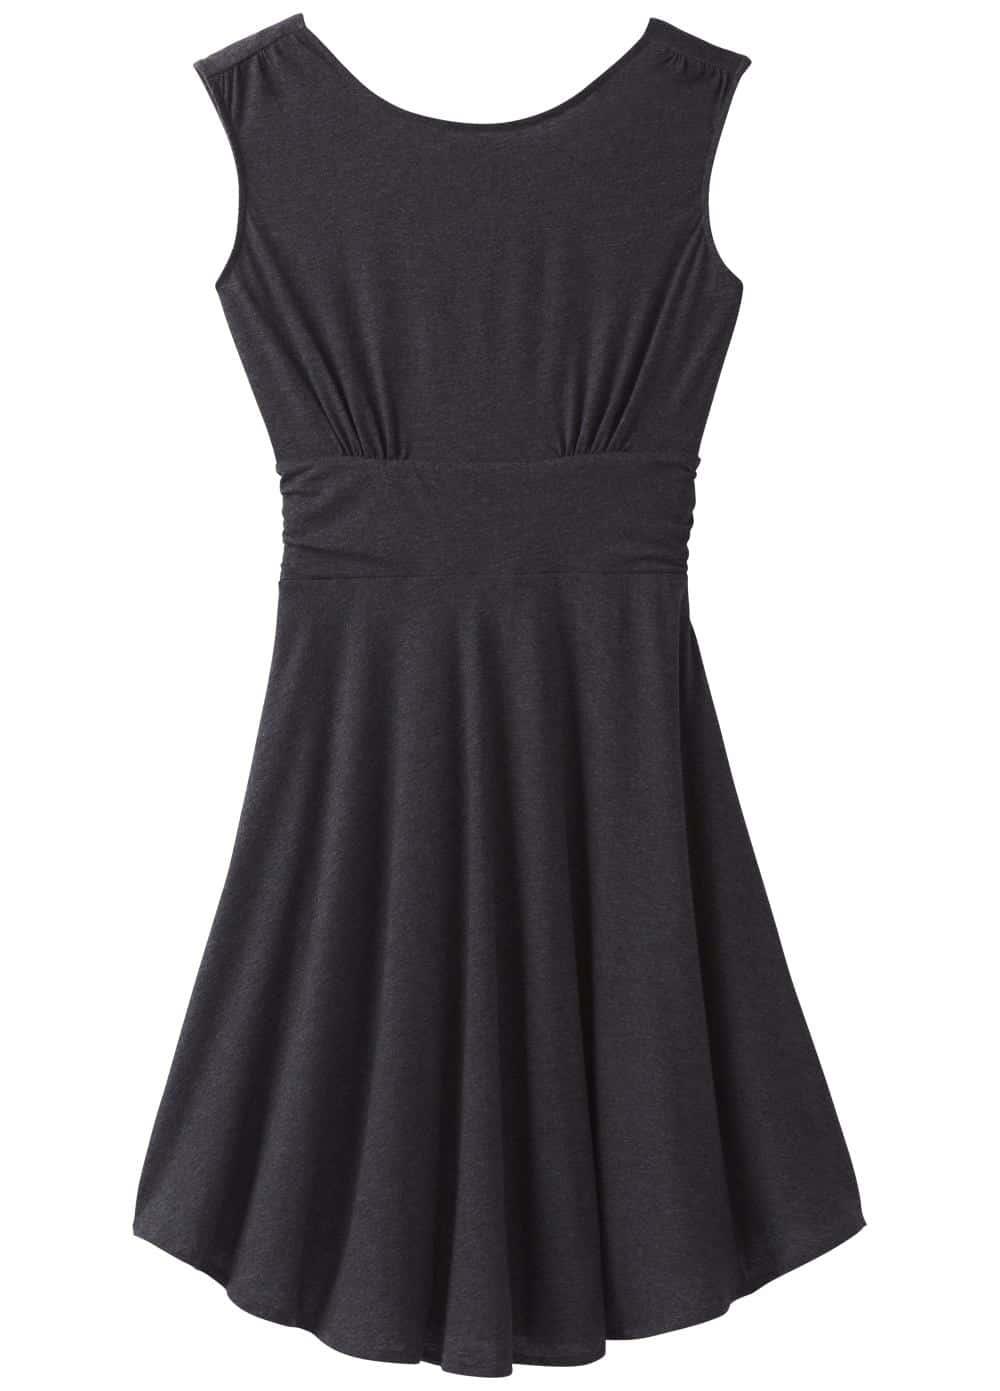 prAna-Jola Dress - Women's